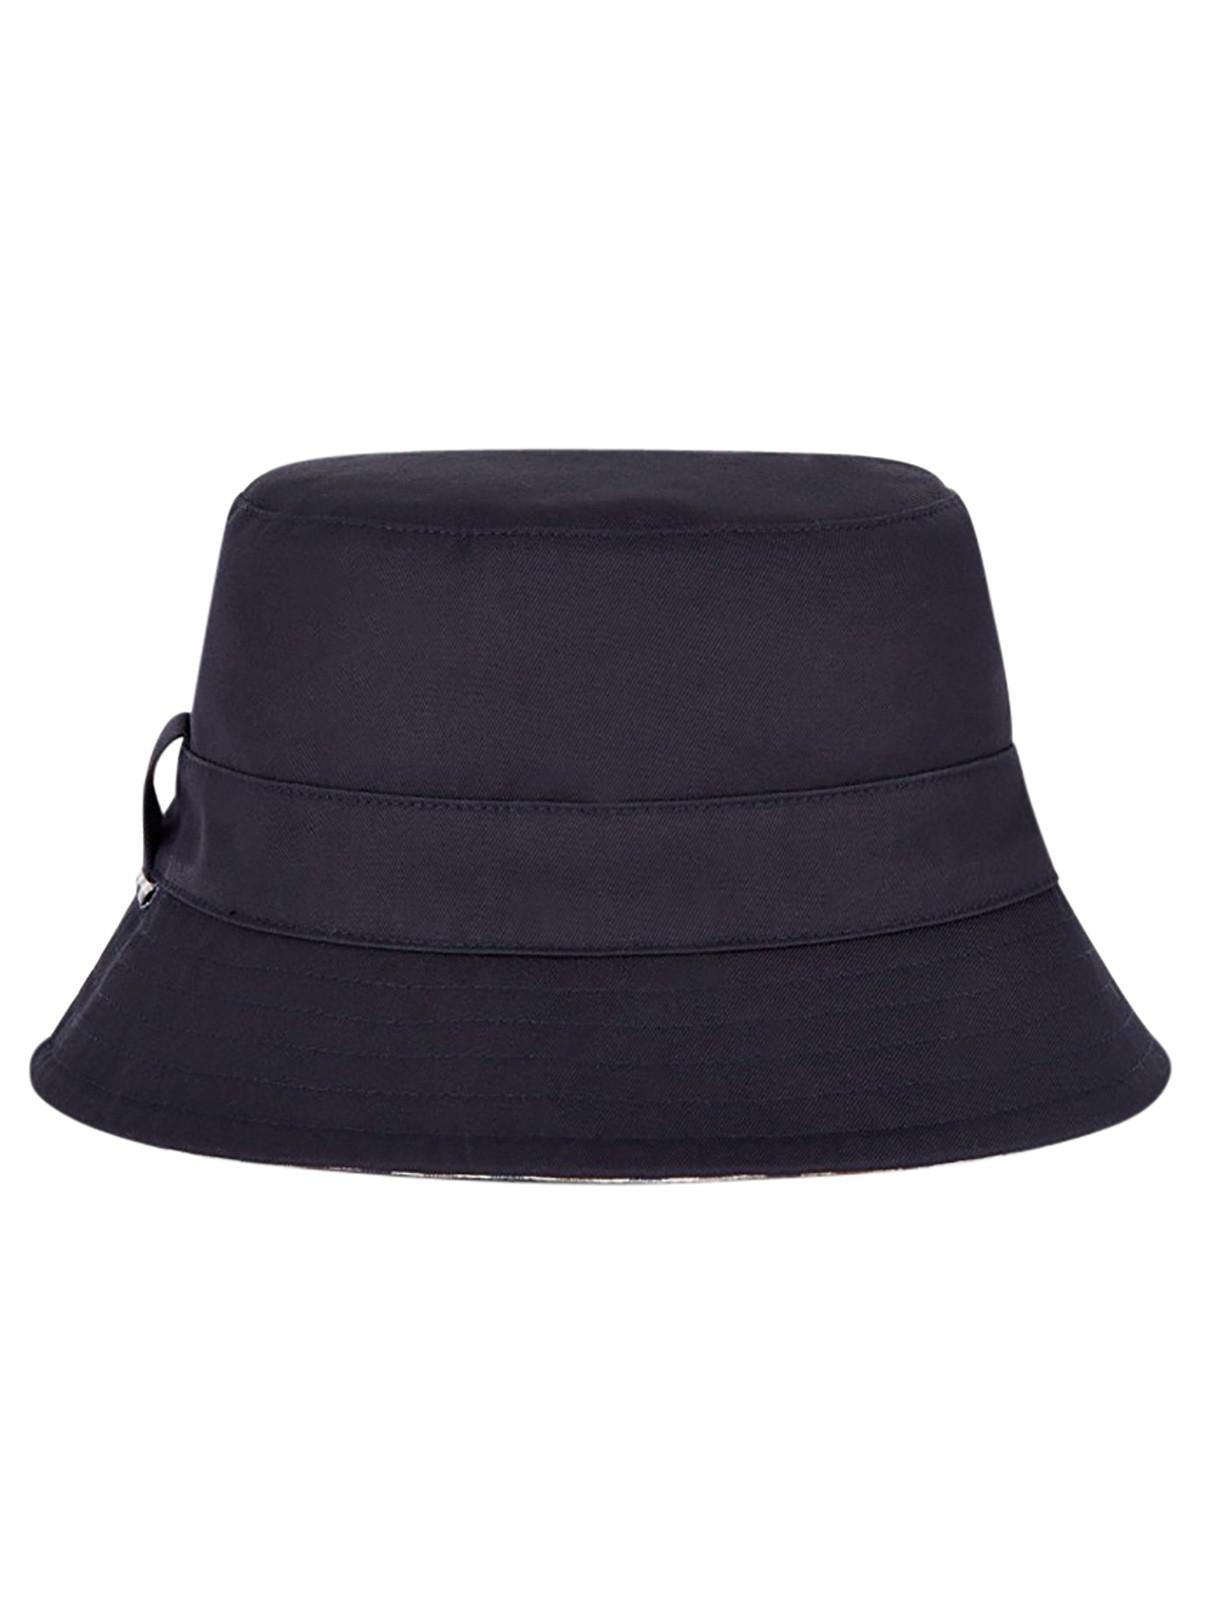 c59e909b7145 Lyst - Aquascutum Navy Reversible Bucket Hat in Blue for Men - Save 26%